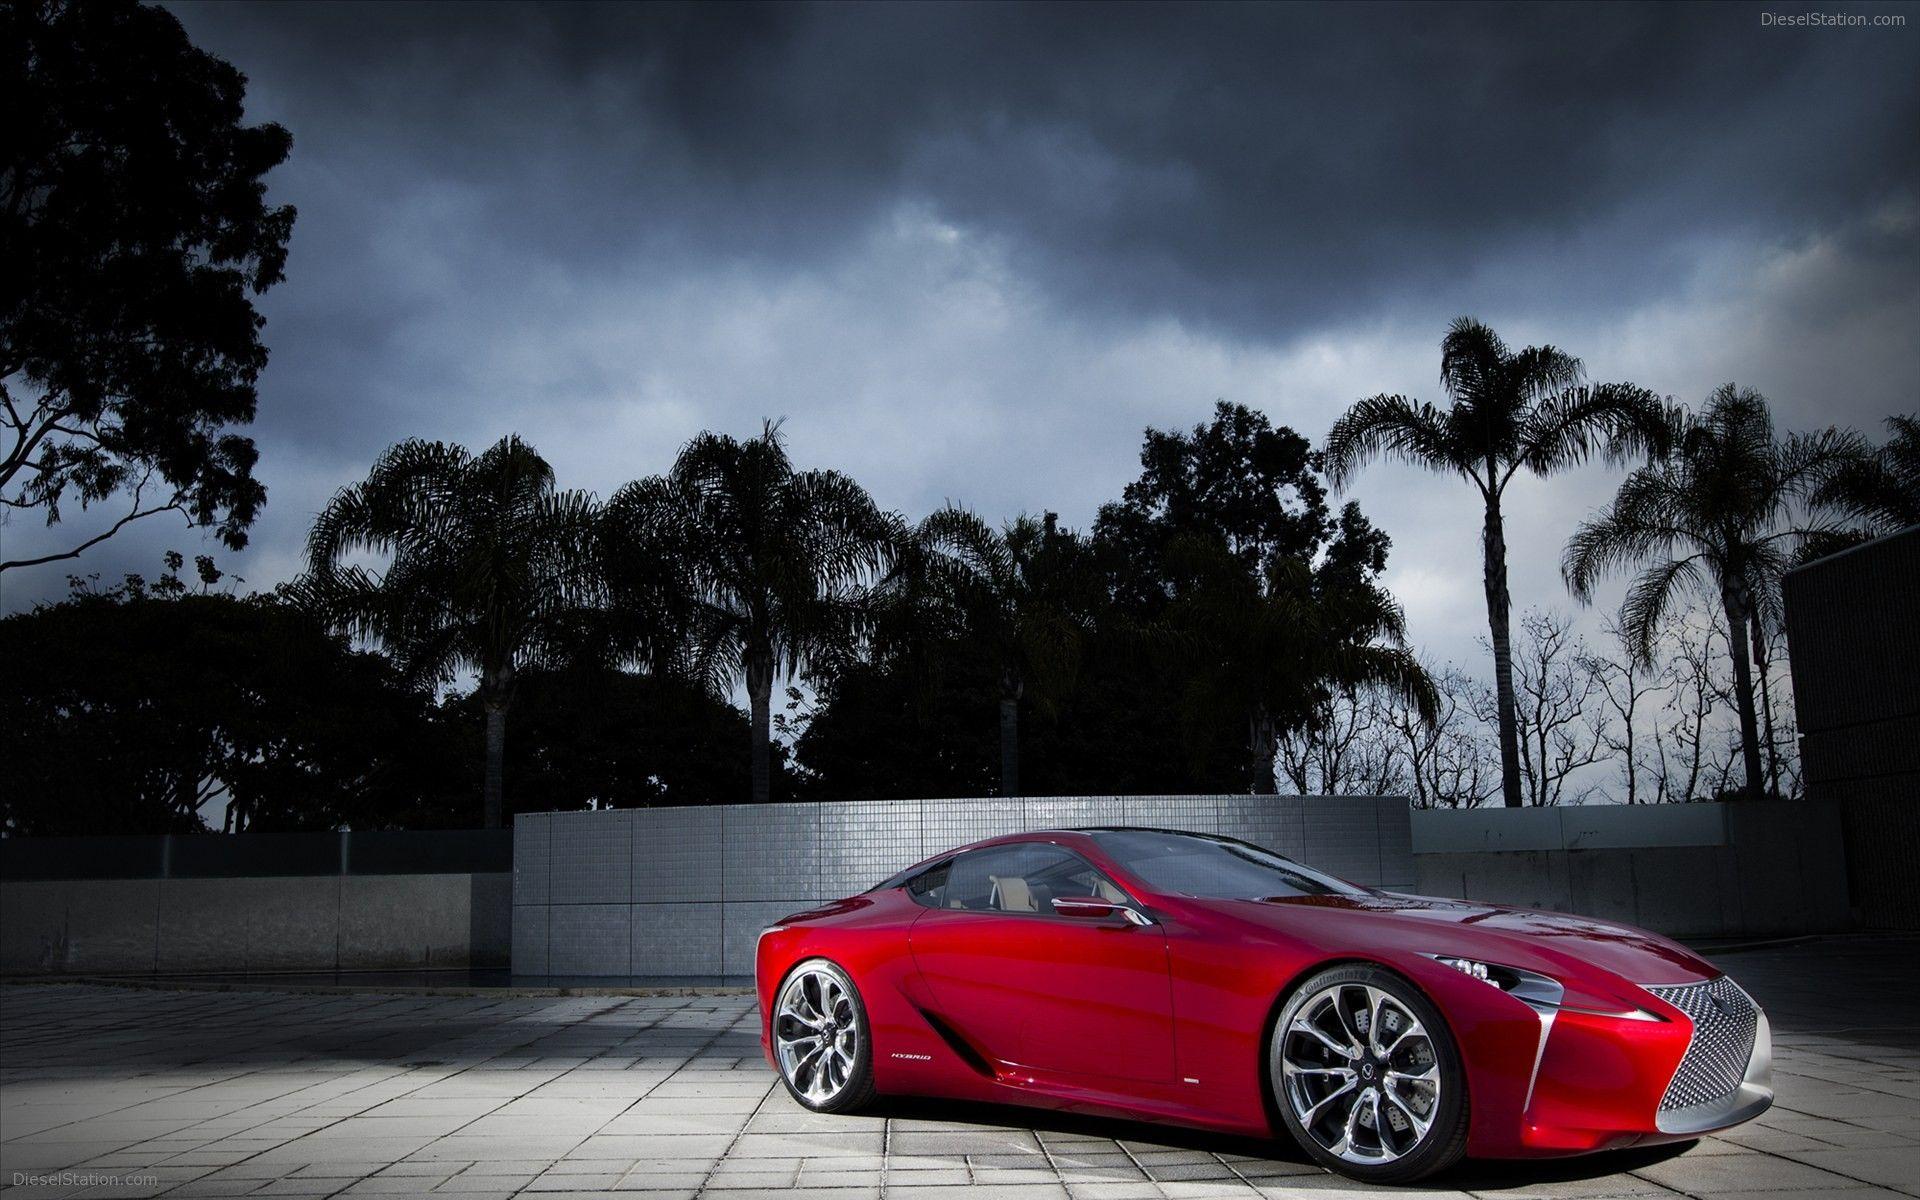 Lexus Lf Lc I Wish My Next Car Lexus Coupe Concept Cars